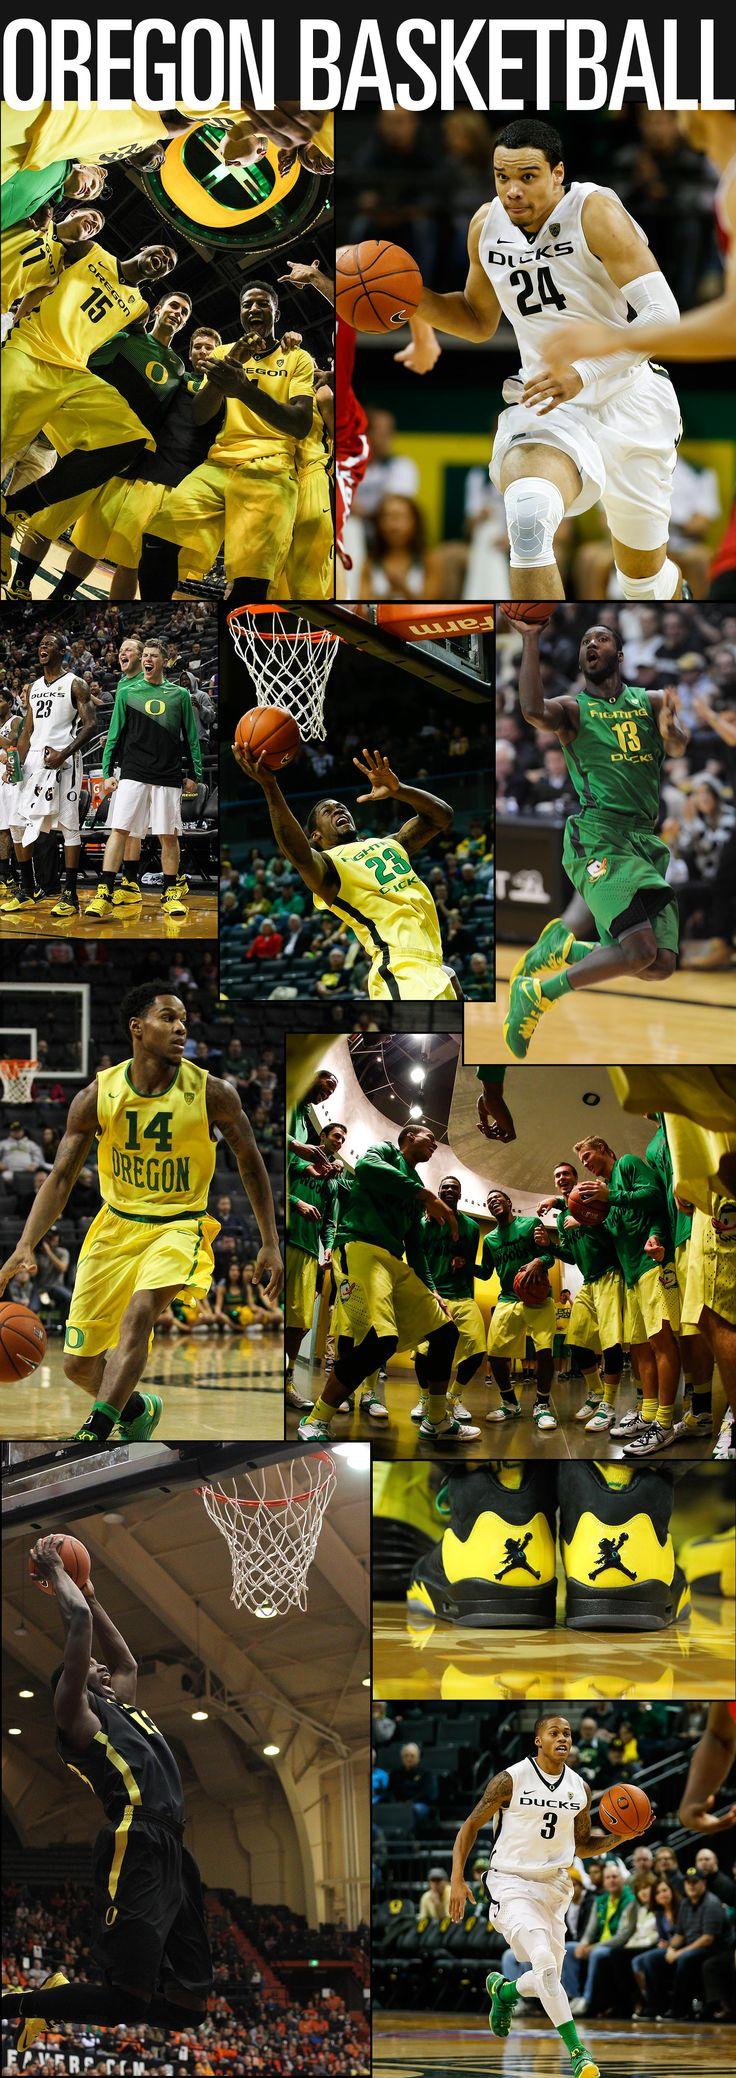 Men's Basketball Uniforms - GoDucks.com - The University of Oregon Official Athletics Web Site